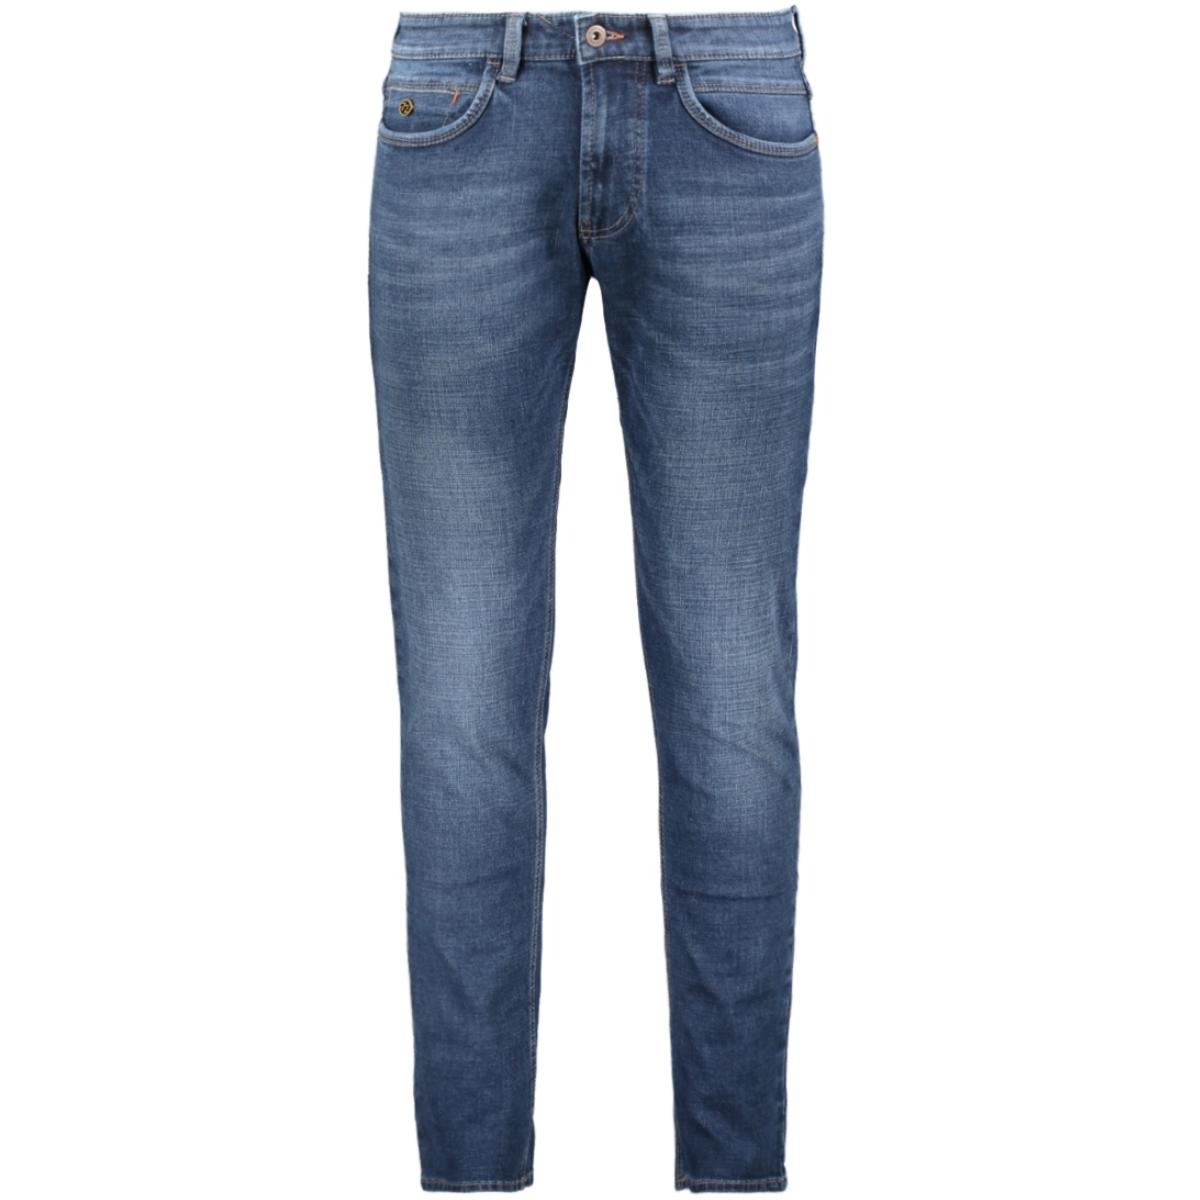 5 pocket harris  9690 688495 hattric jeans 42